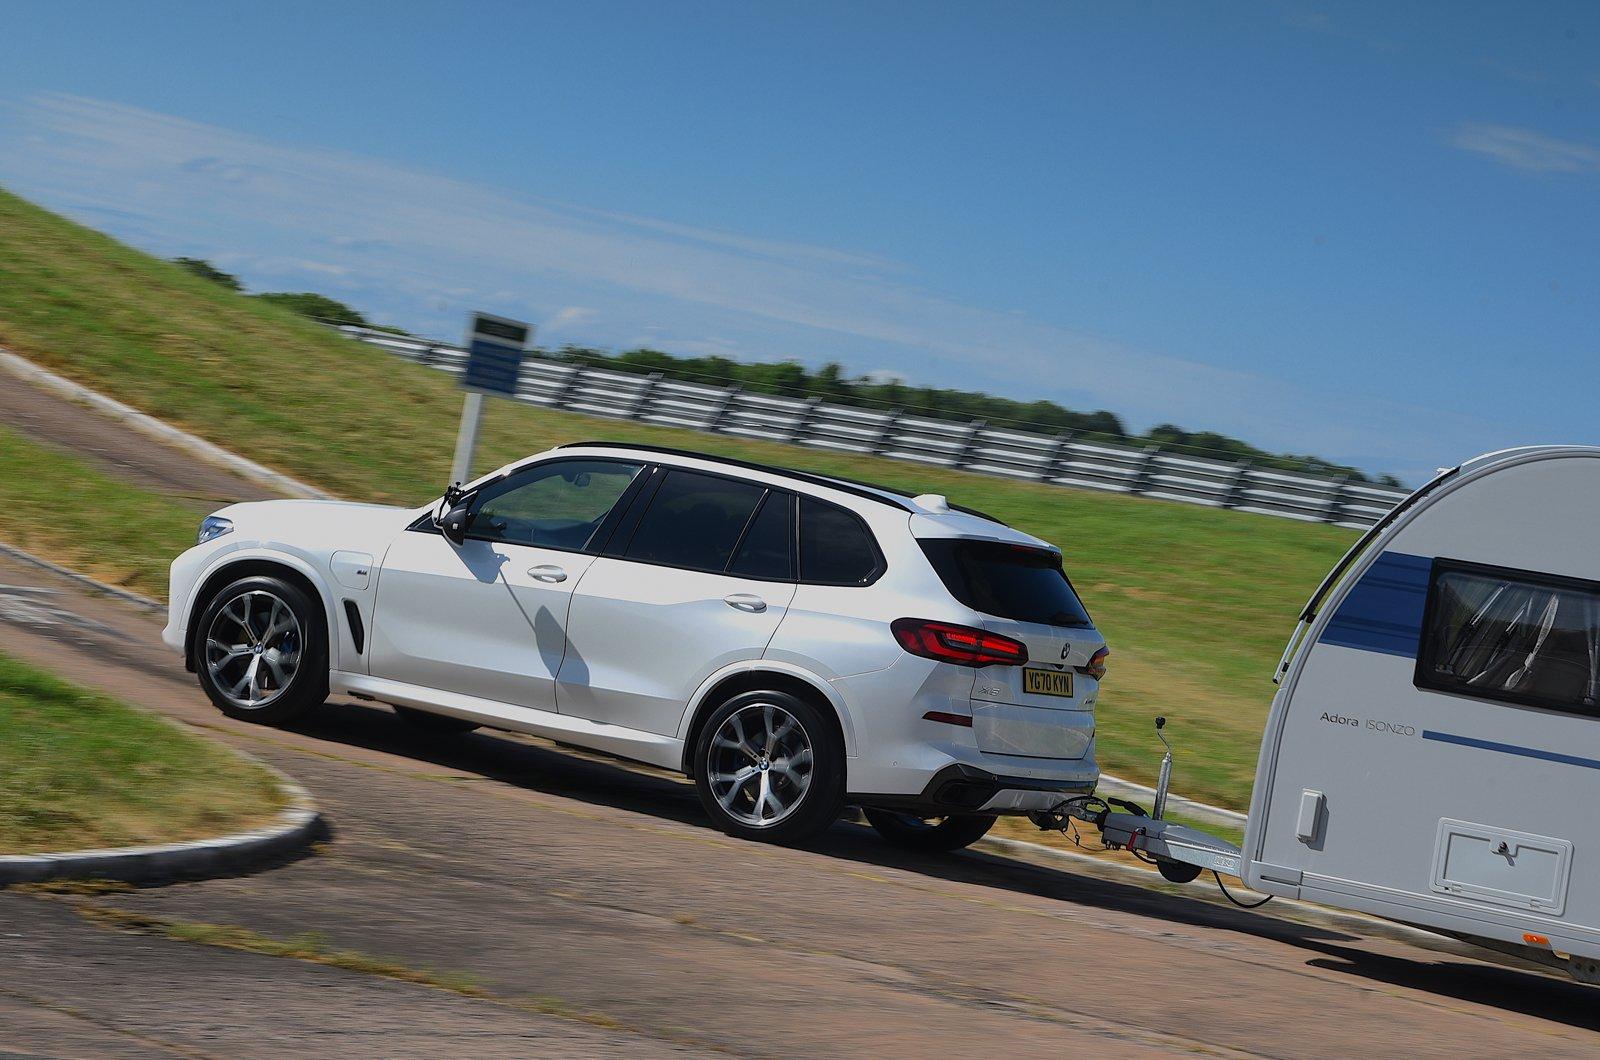 BMW X5 towing a caravan - rear